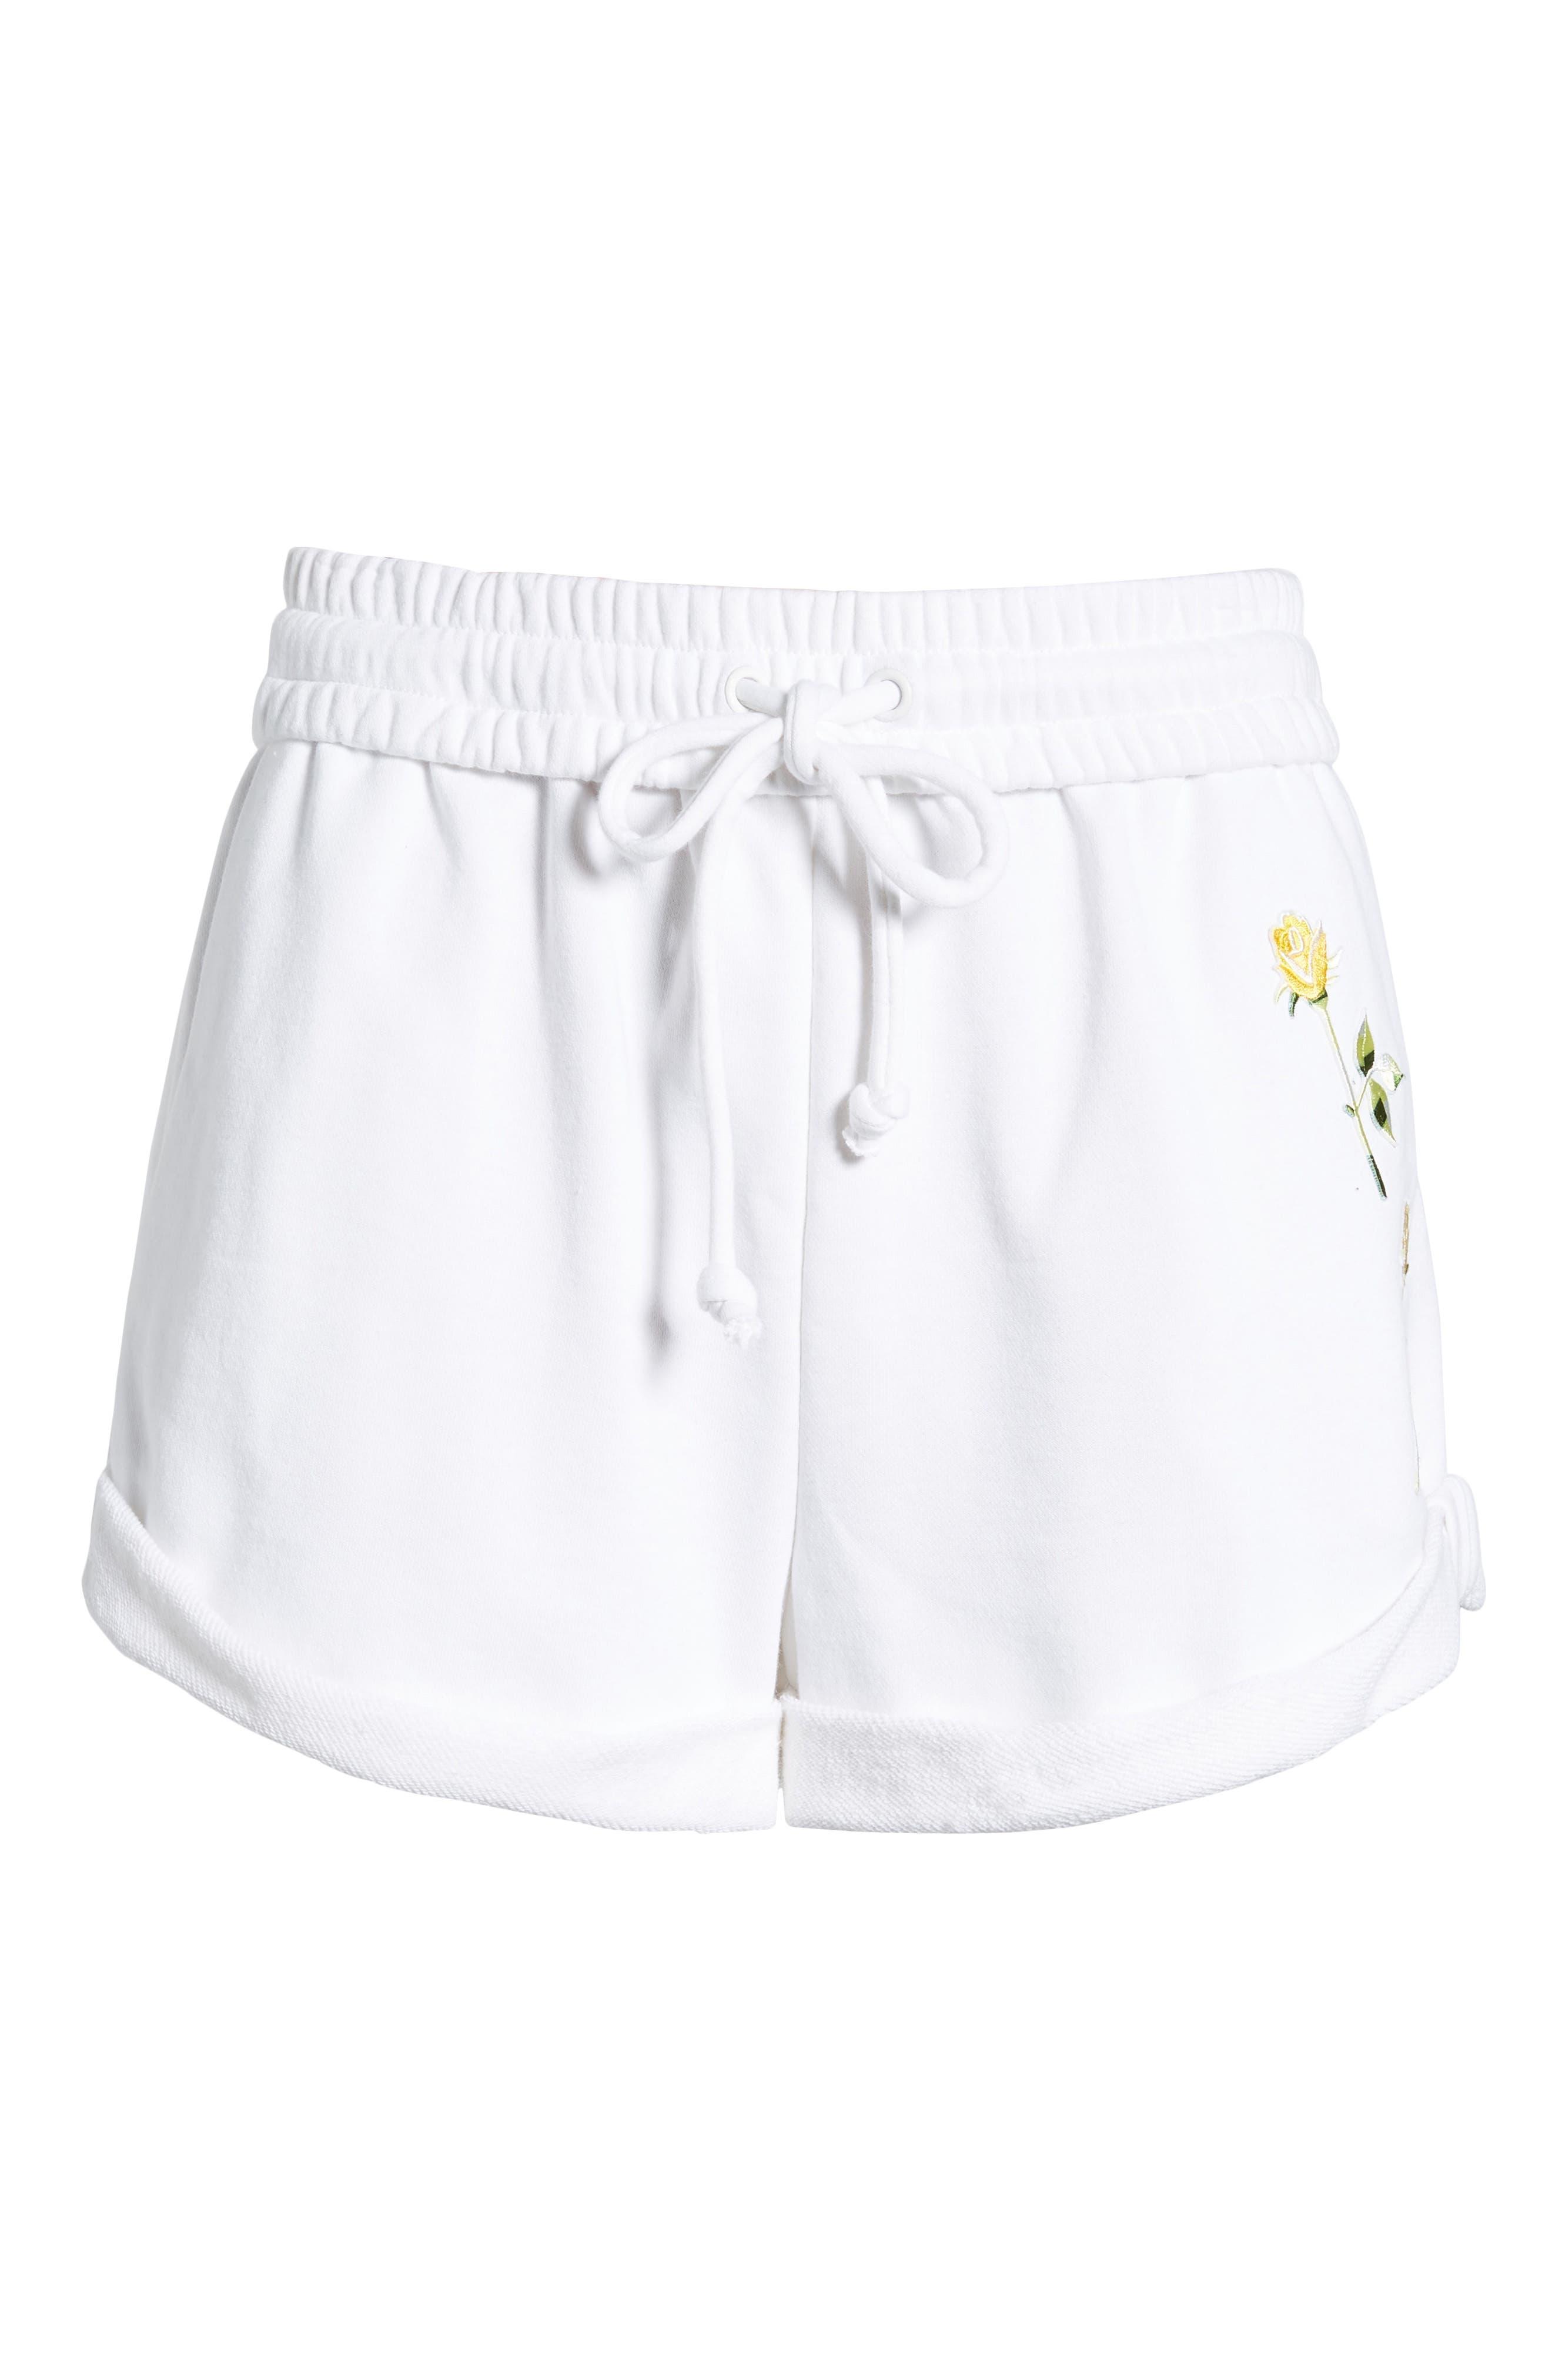 Rolled Drawstring Shorts,                             Alternate thumbnail 6, color,                             Bright White